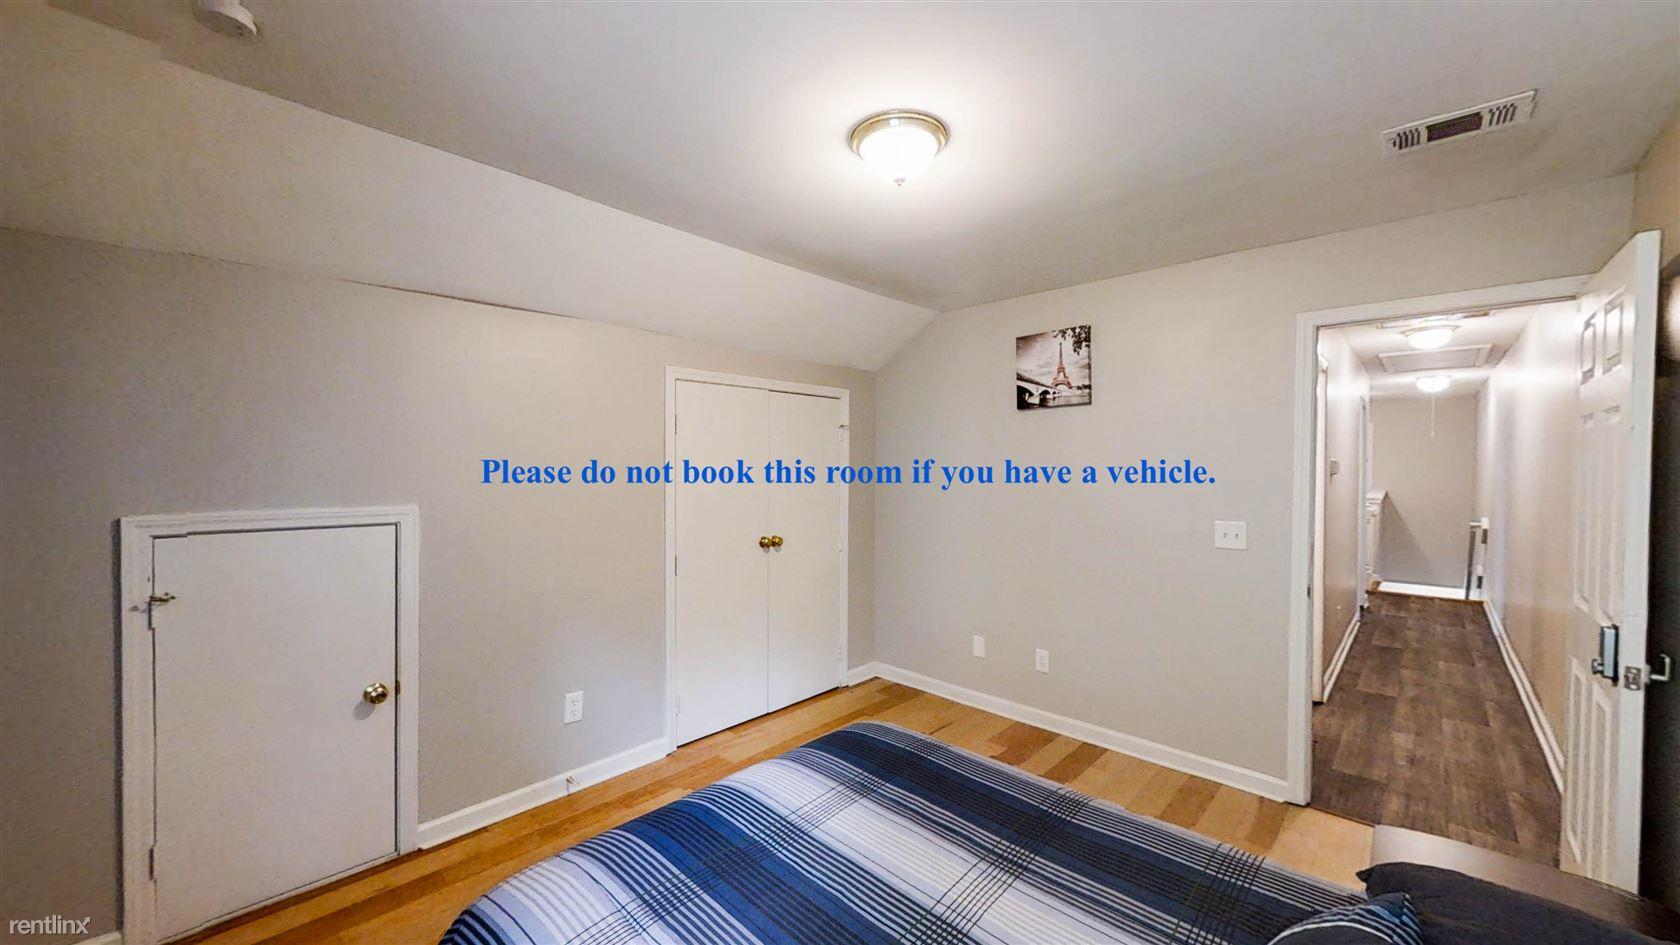 Joseph E. Boone Blvd Nw&aurora Ave Nw, Ga (id.269) rental